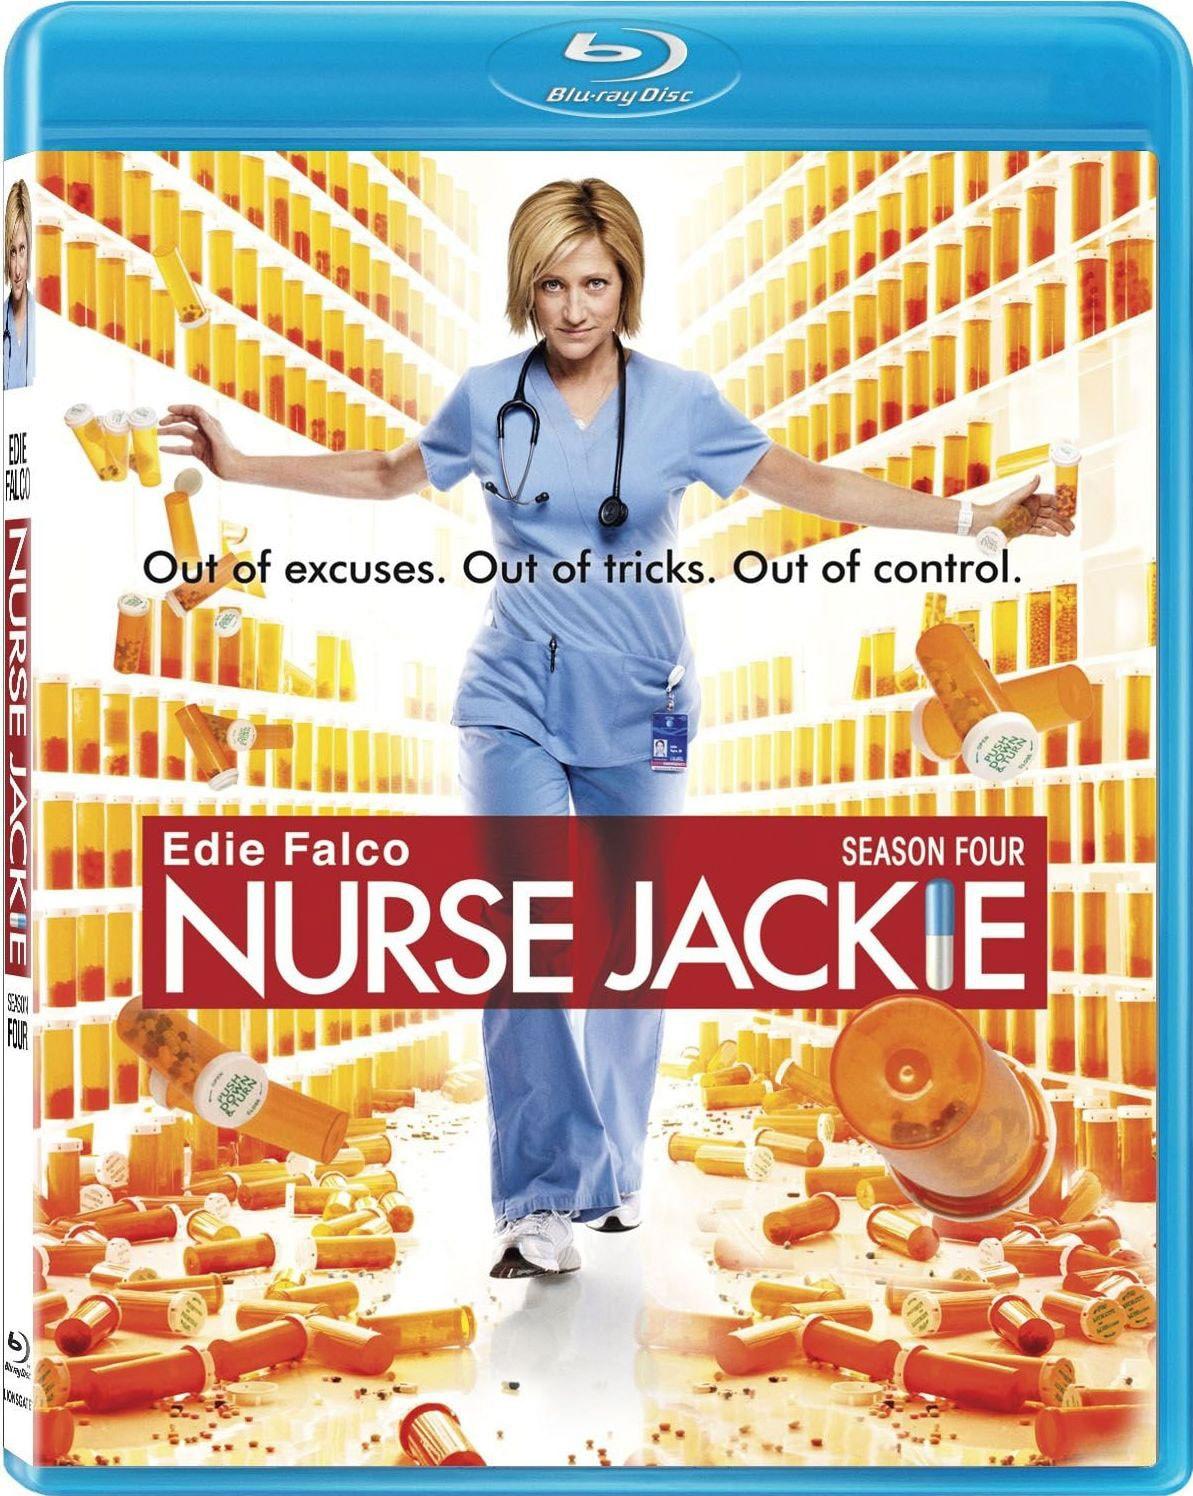 Nurse Jackie: Season 4 (Blu-ray Disc)